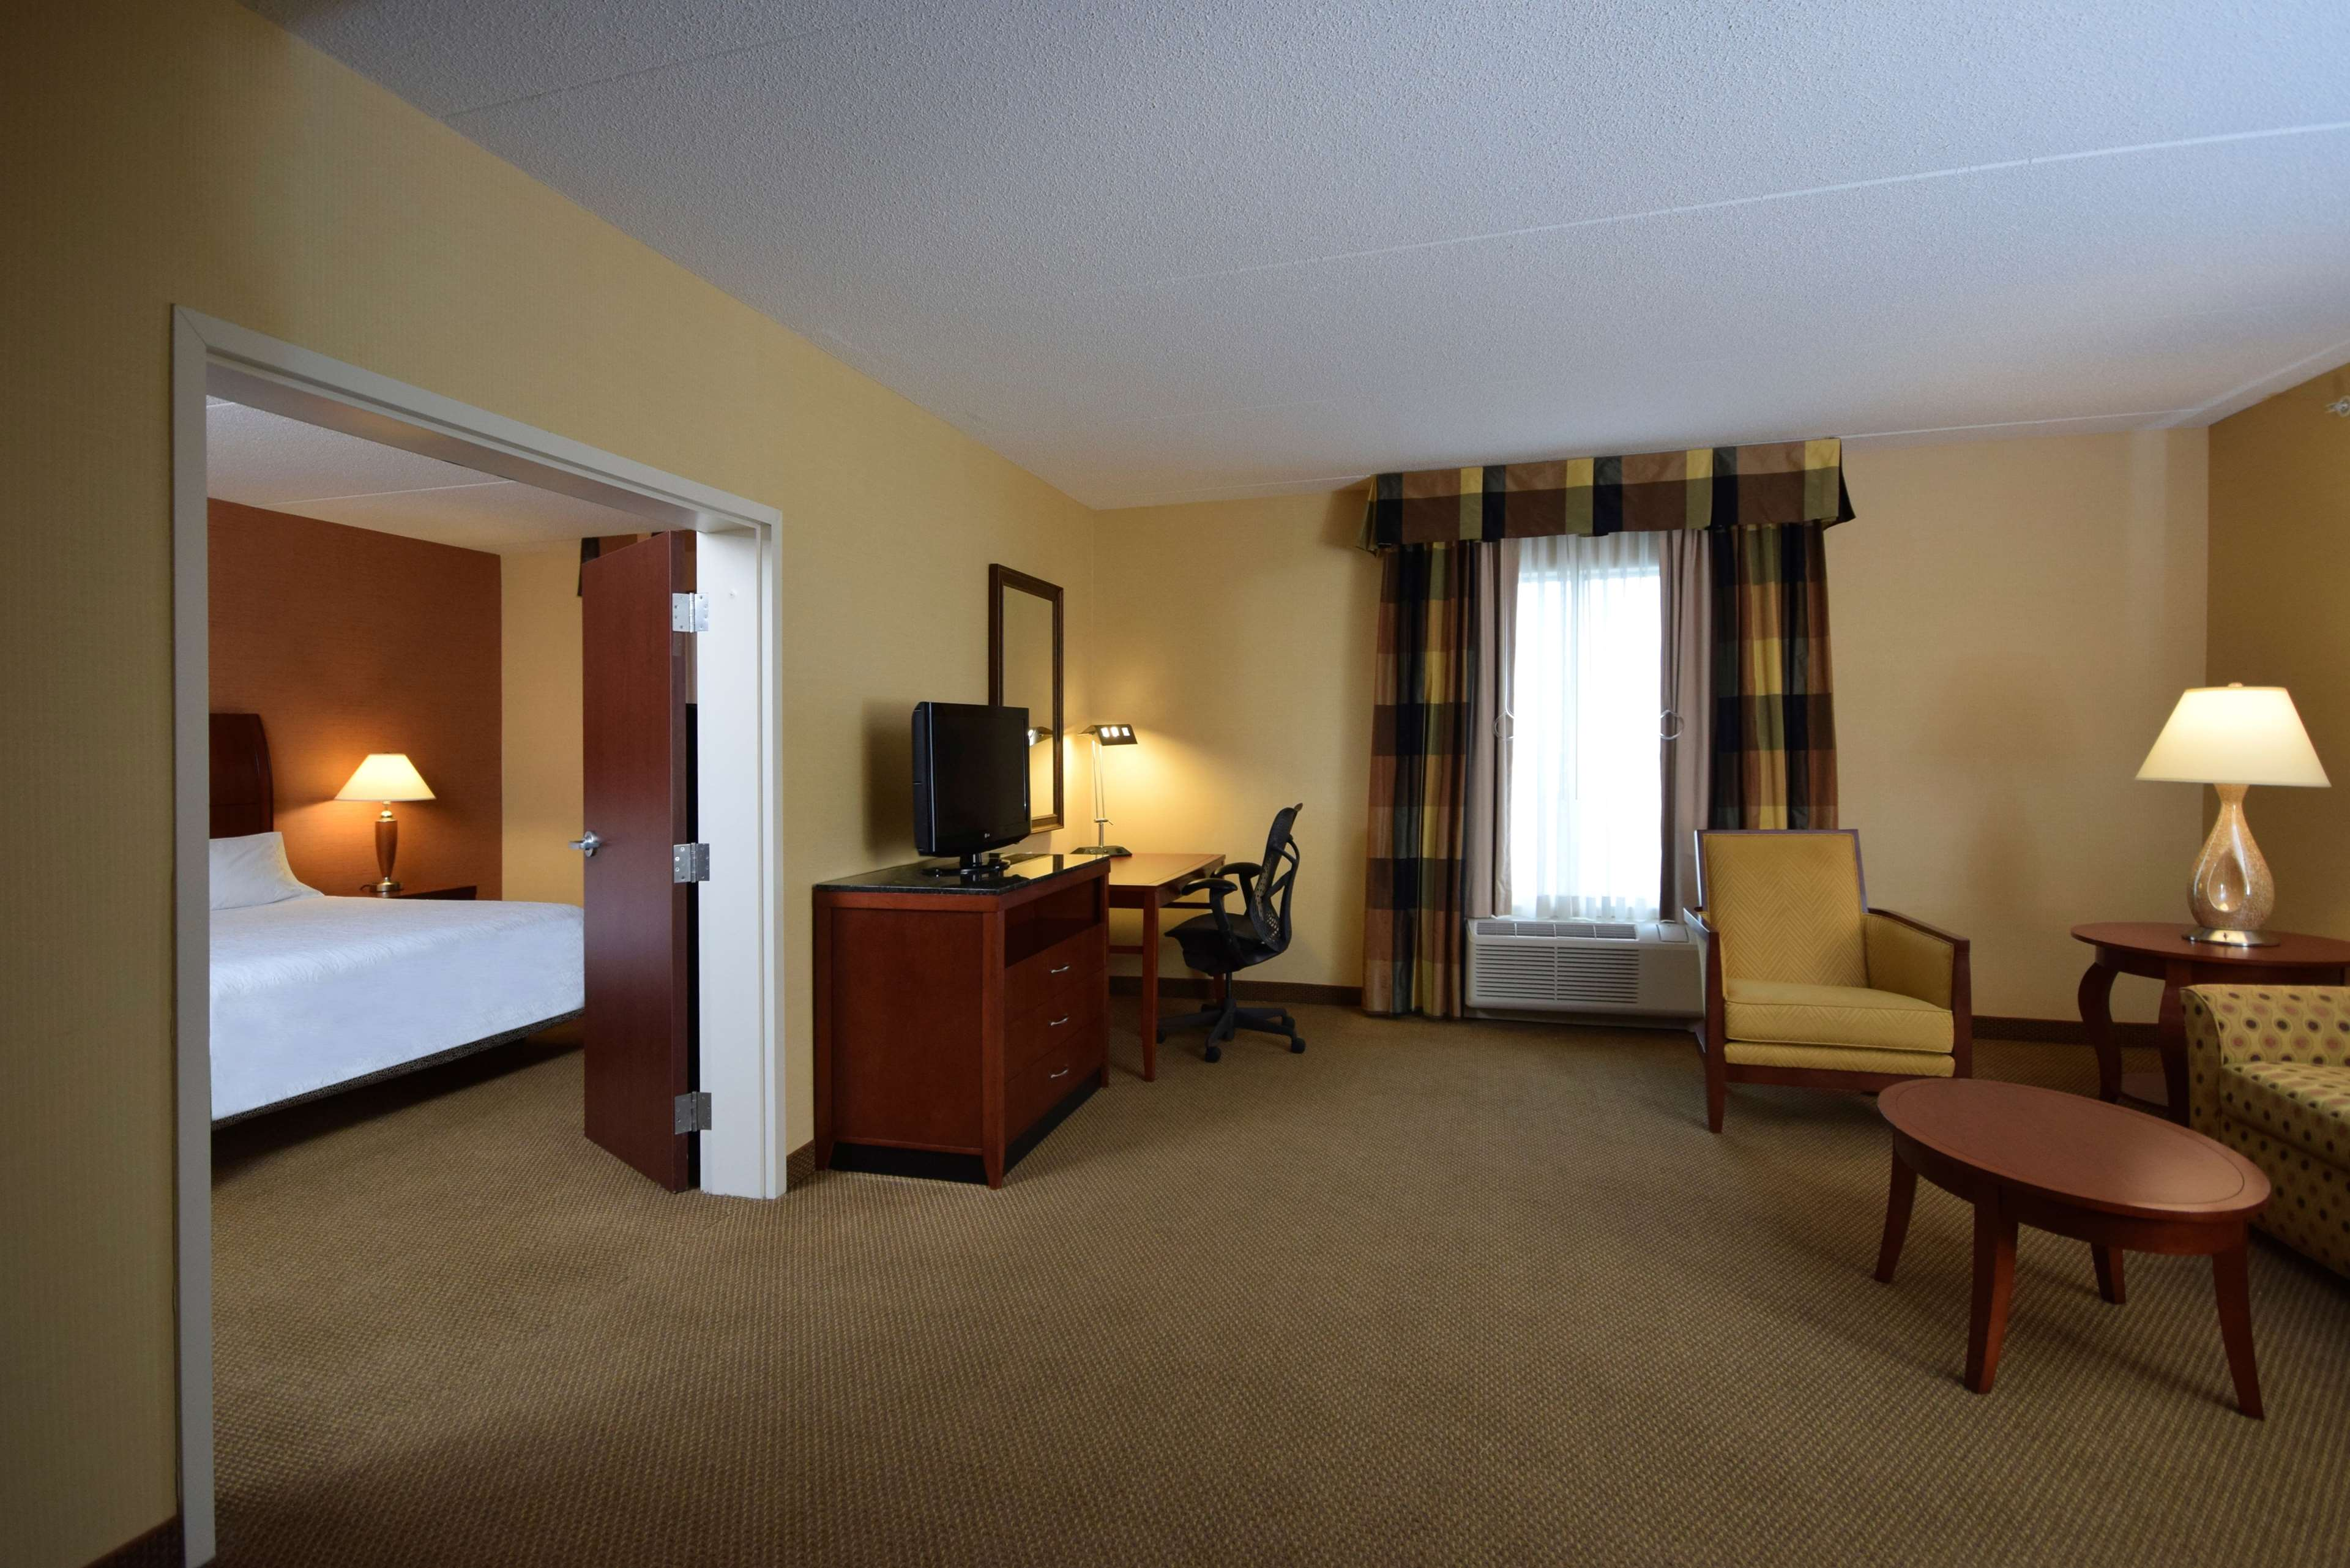 Hilton Garden Inn Dayton Beavercreek image 17